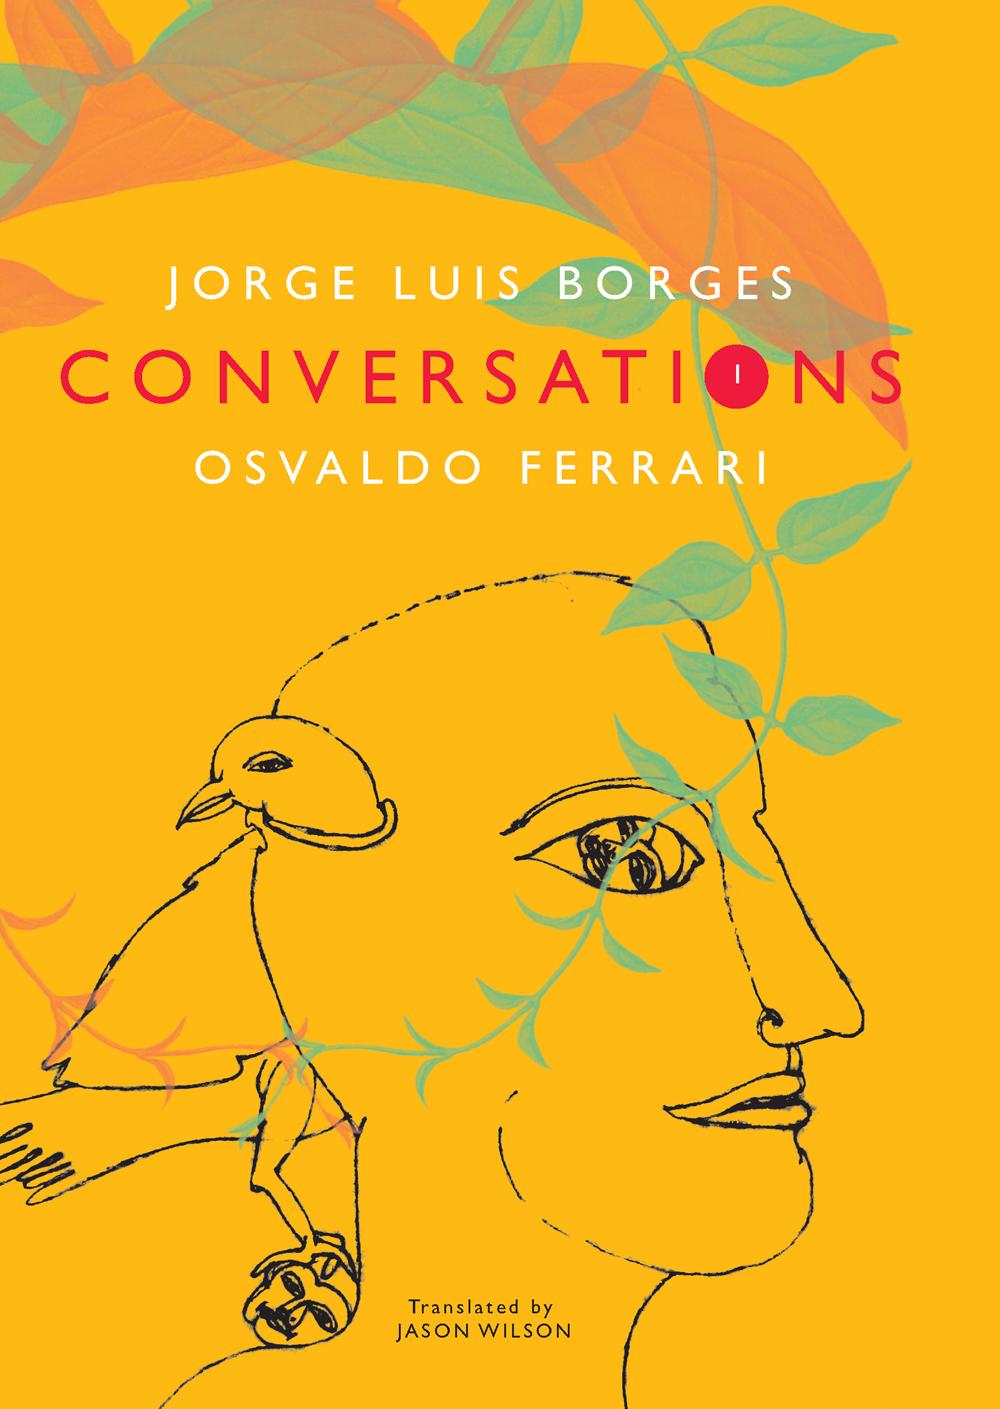 Conversations, Volume 1 | Jorge Luis Borges, Osvaldo Ferrari | Seagull Books